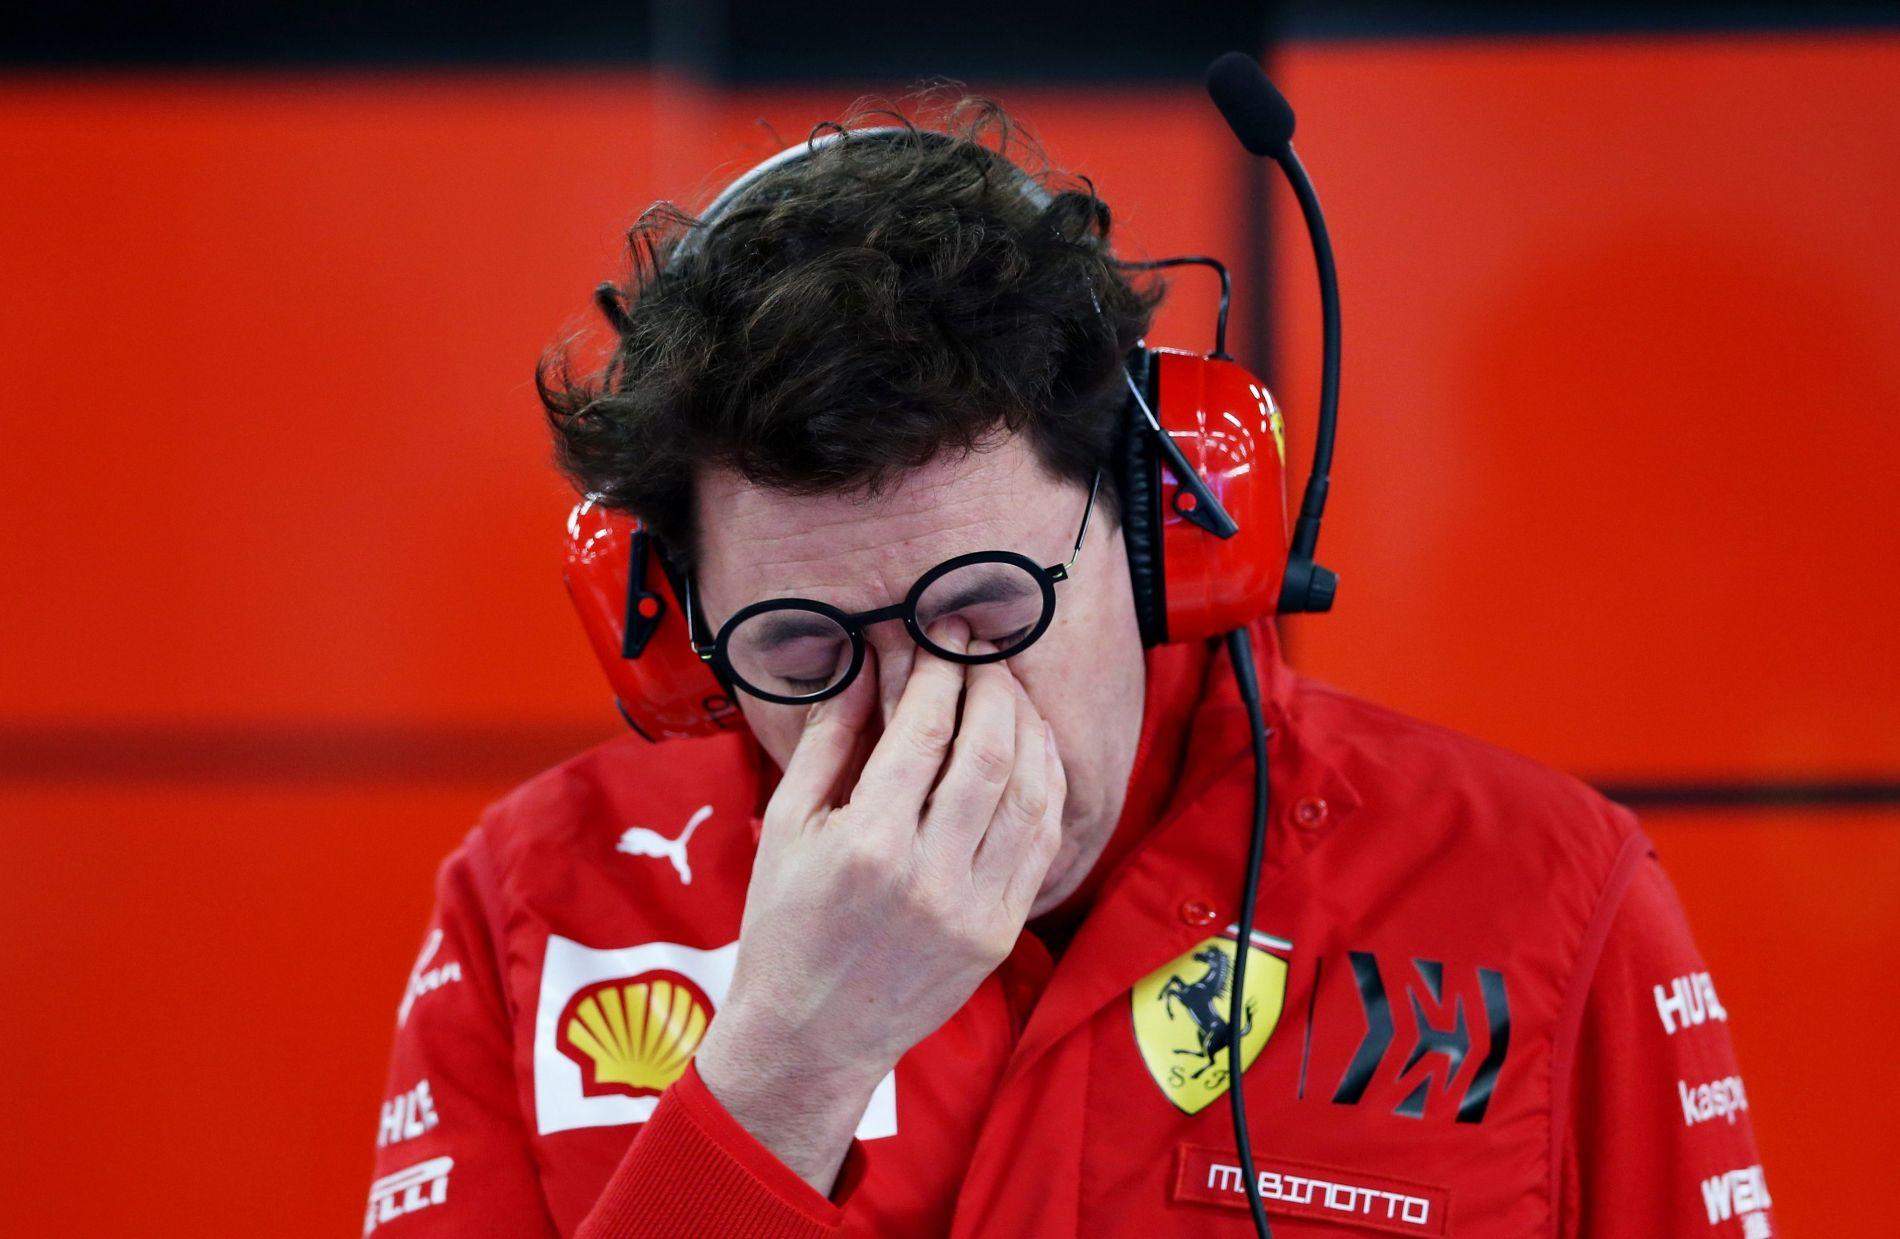 Scuderia Ferrari - ცვლილებების დროა